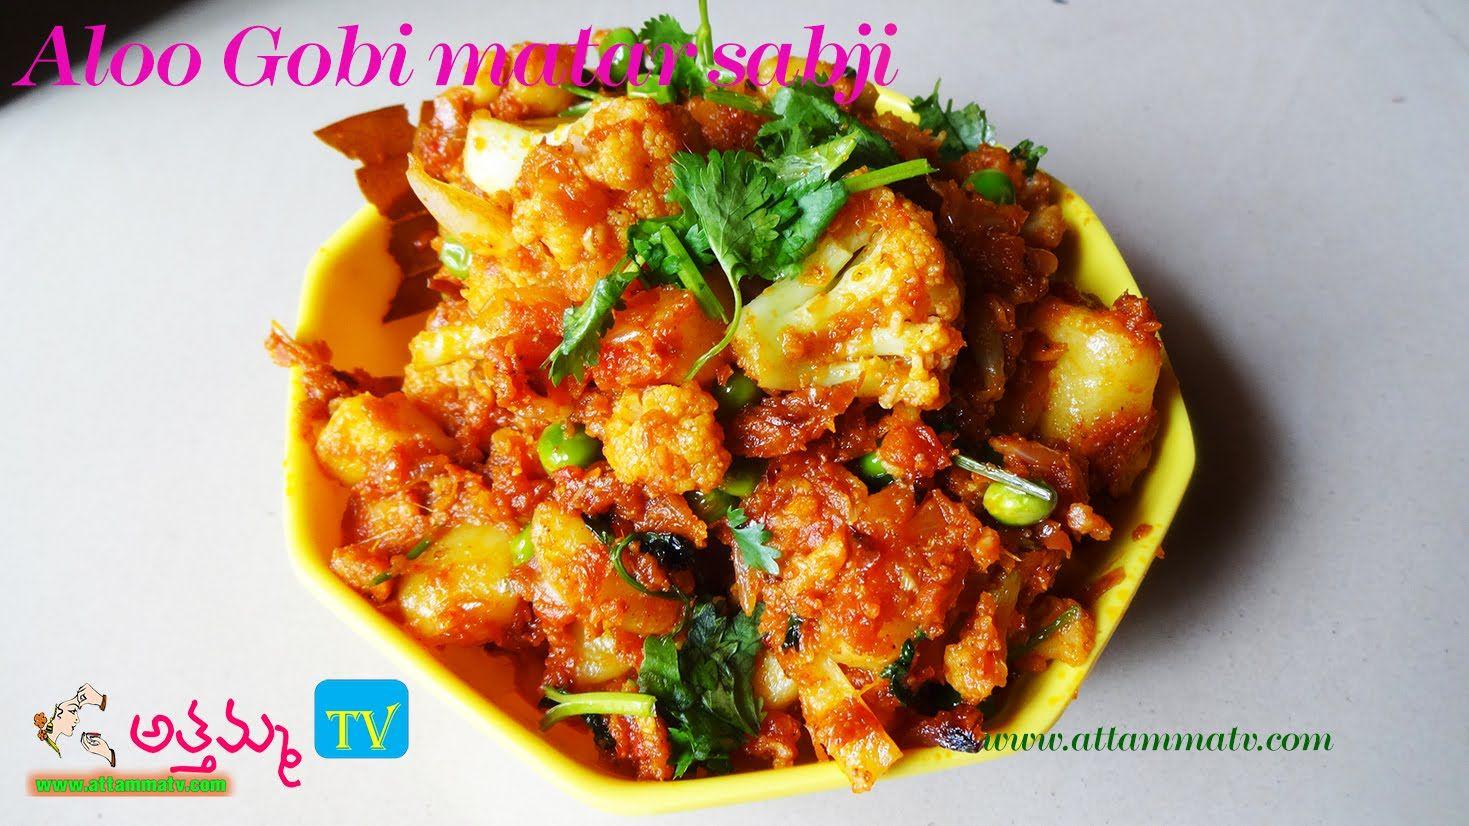 Aloo gobi matar sabji recipe in telugu by attamma tv north aloo gobi matar sabji recipe in telugu by attamma tv forumfinder Image collections